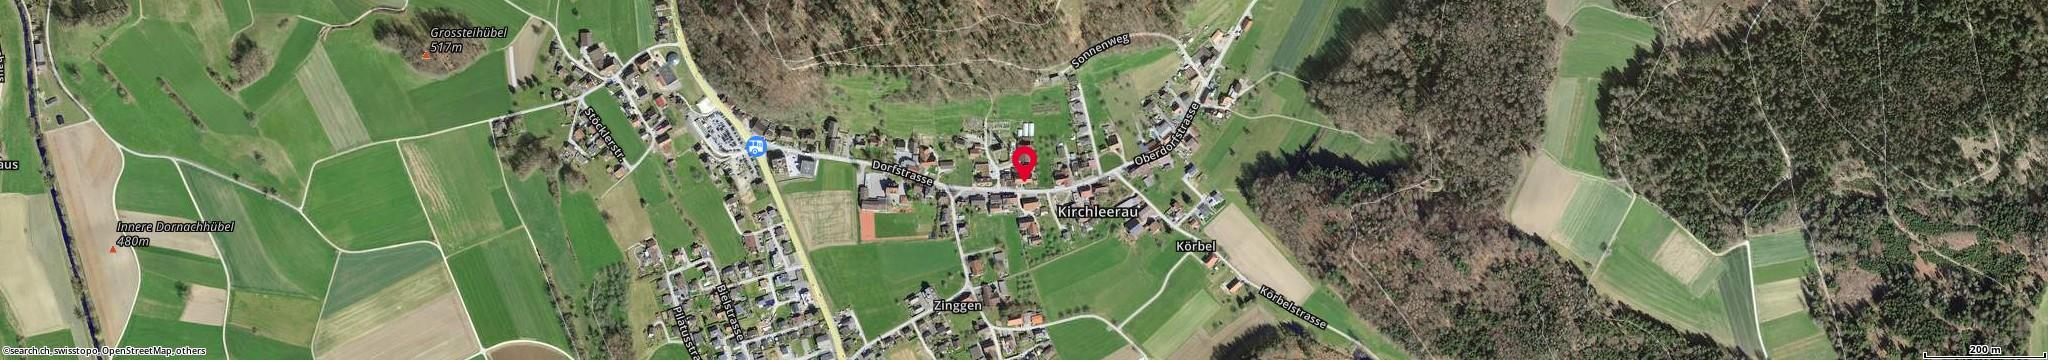 Dorfstr. 42, 5054 Kirchleerau